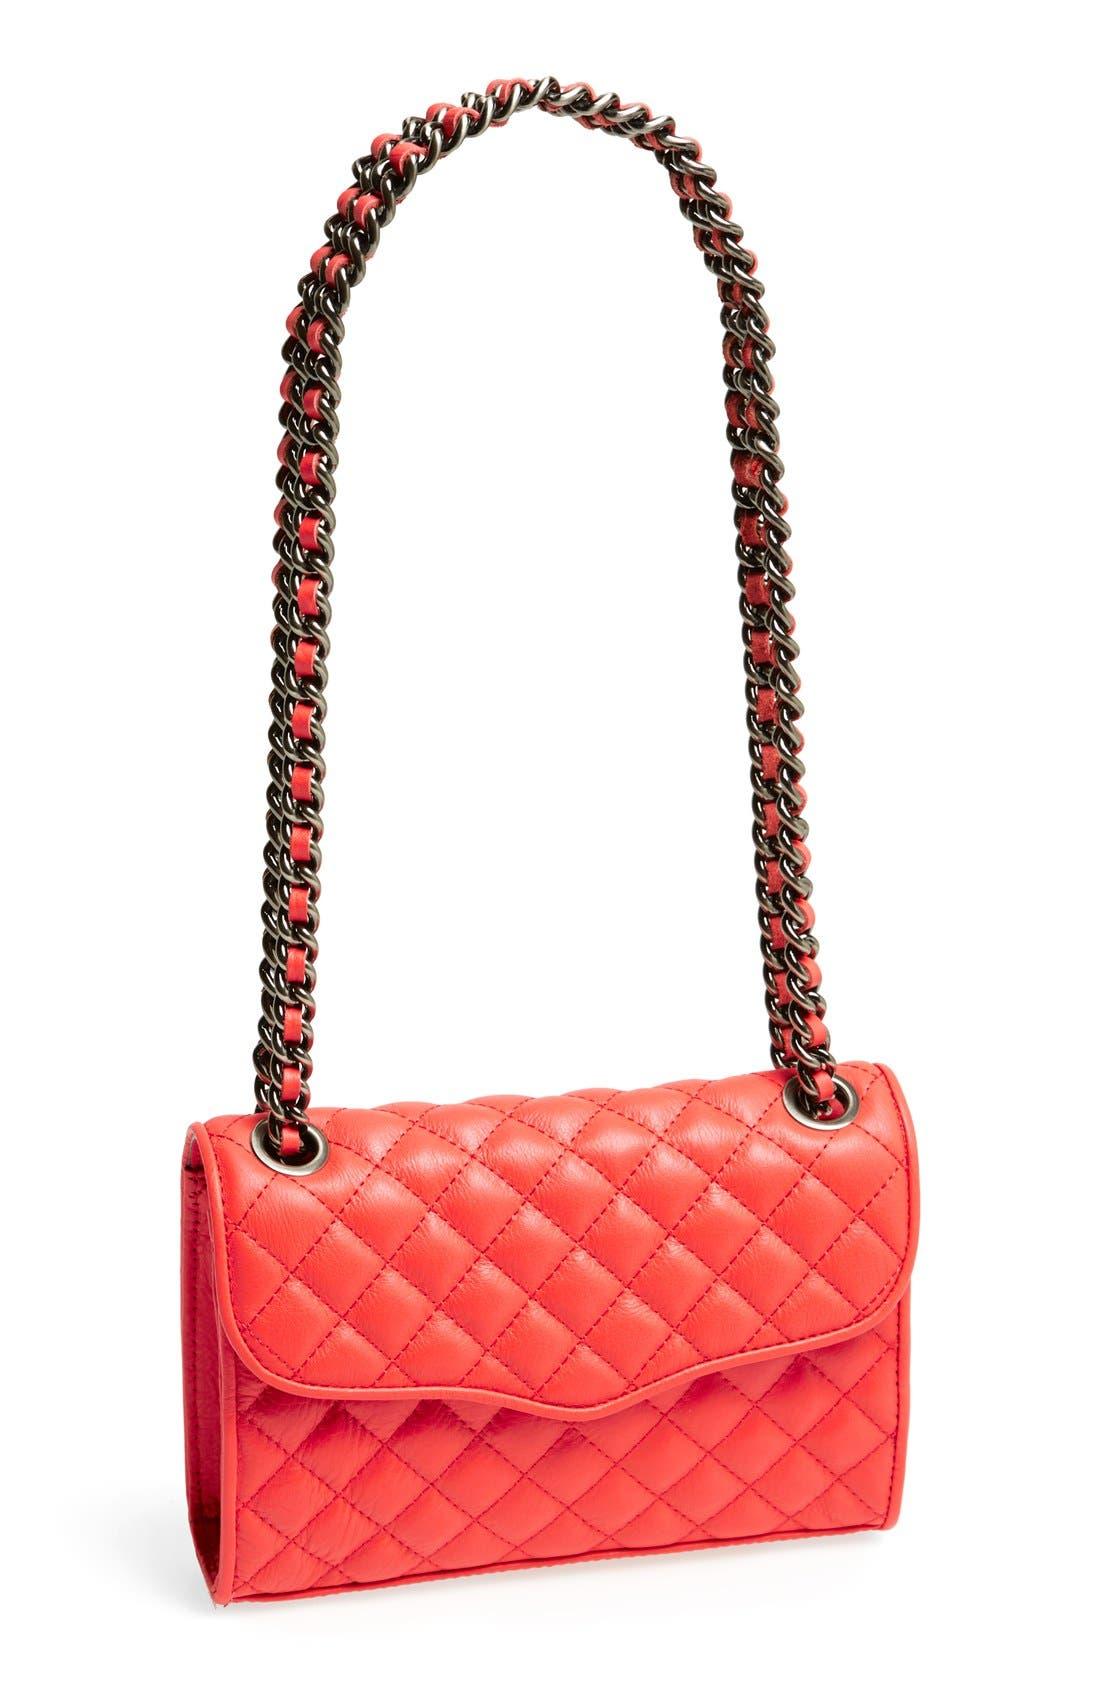 Main Image - Rebecca Minkoff 'Mini Affair' Convertible Crossbody Bag